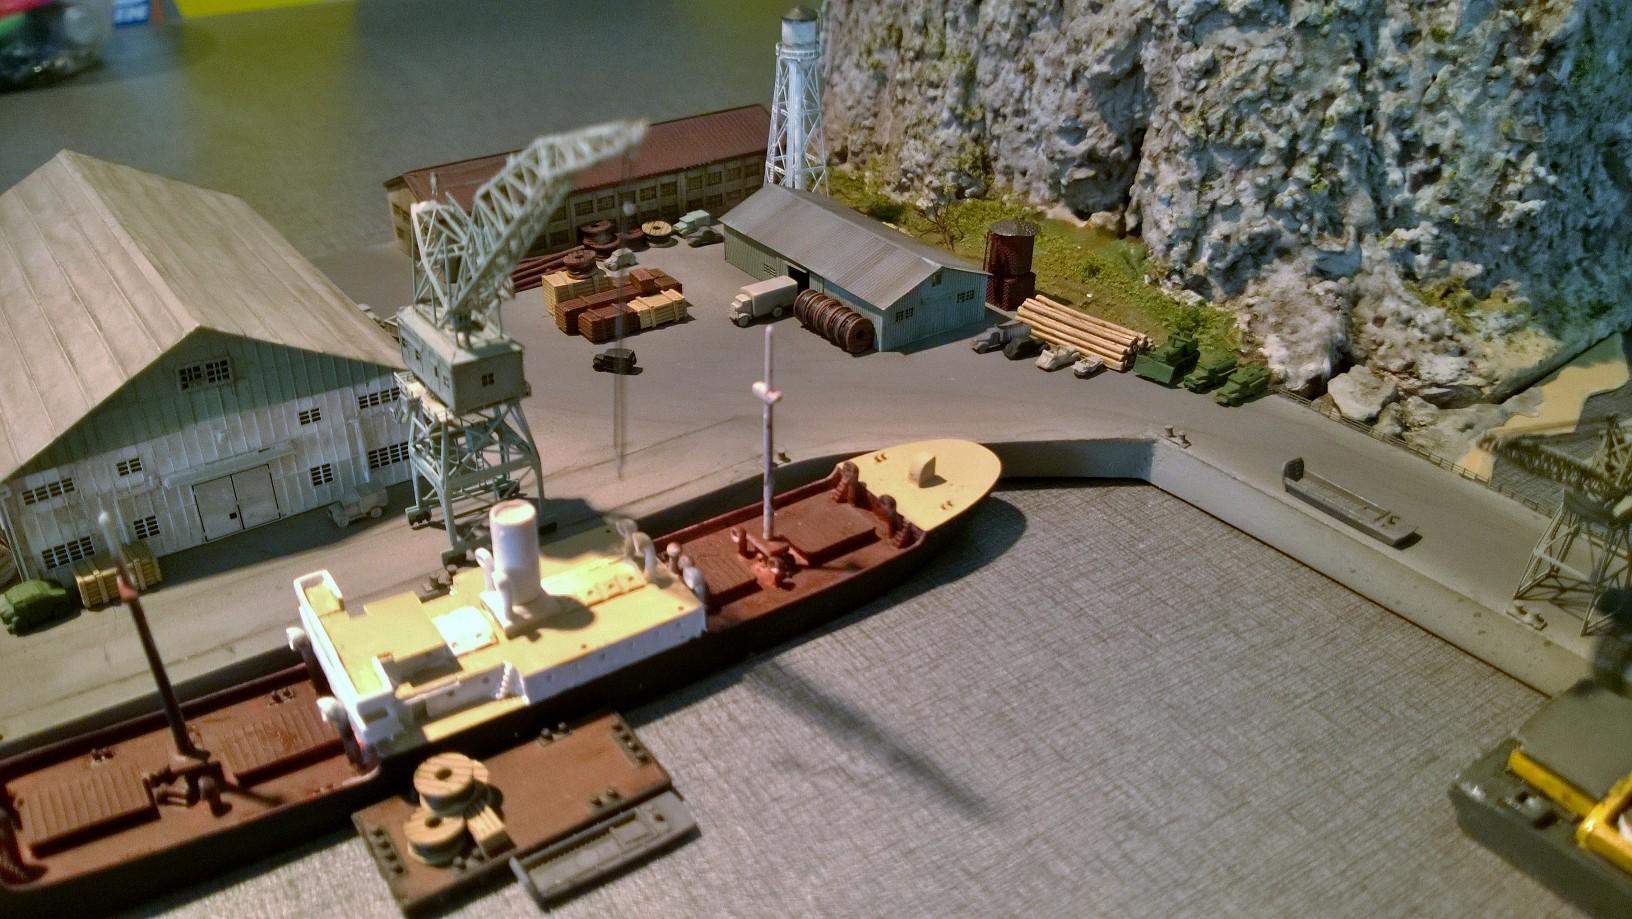 Diorama base navale 1/700 par Nesquik - Page 3 N70ov